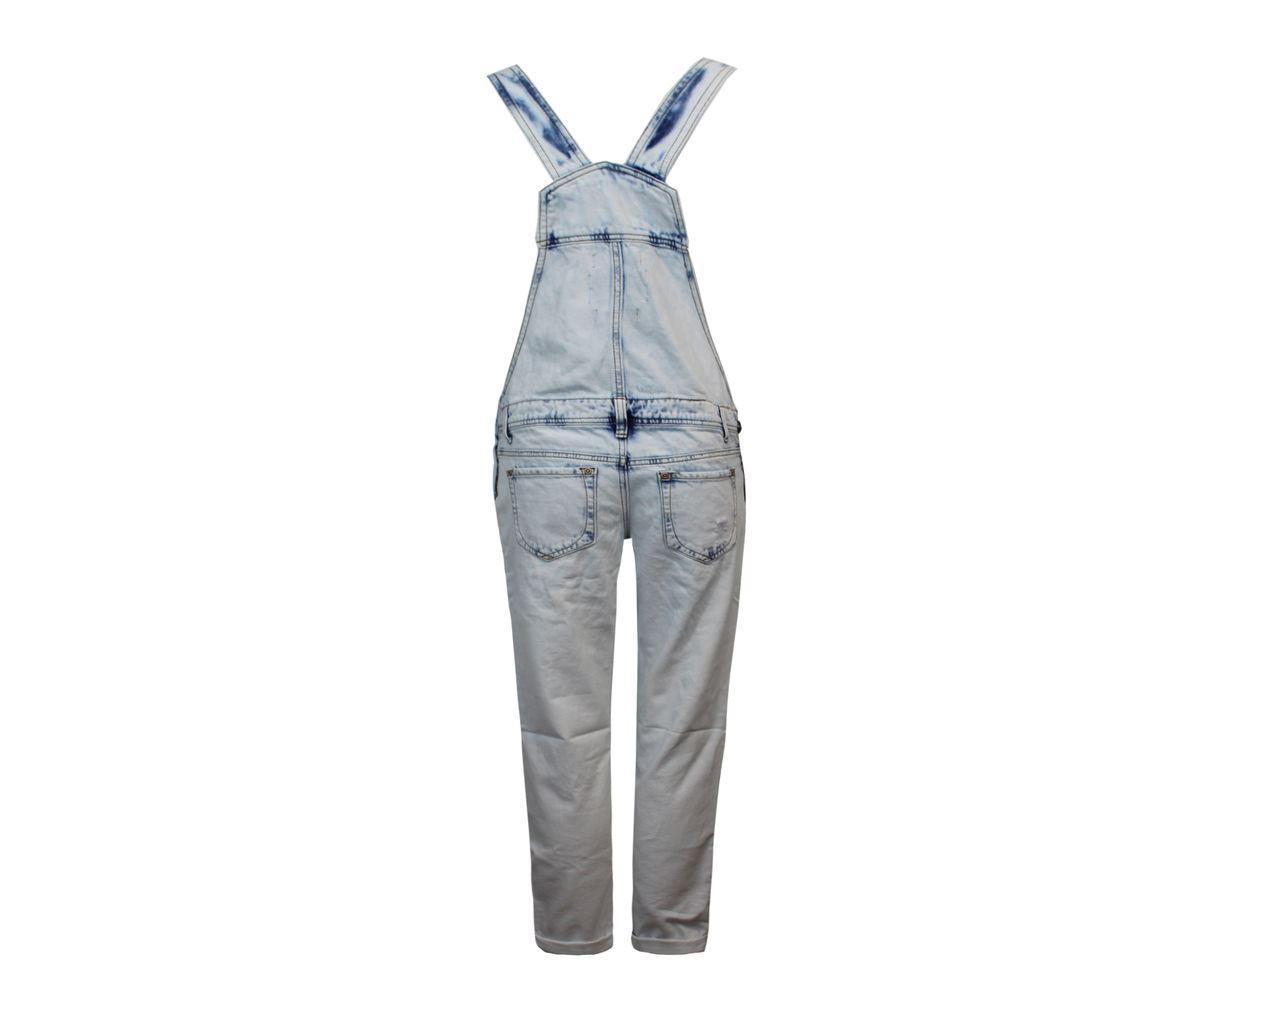 Bolsillo-senoras-boton-Denim-Hot-Pant-peto-corto-para-mujer-larga-Jeans-Mono miniatura 3